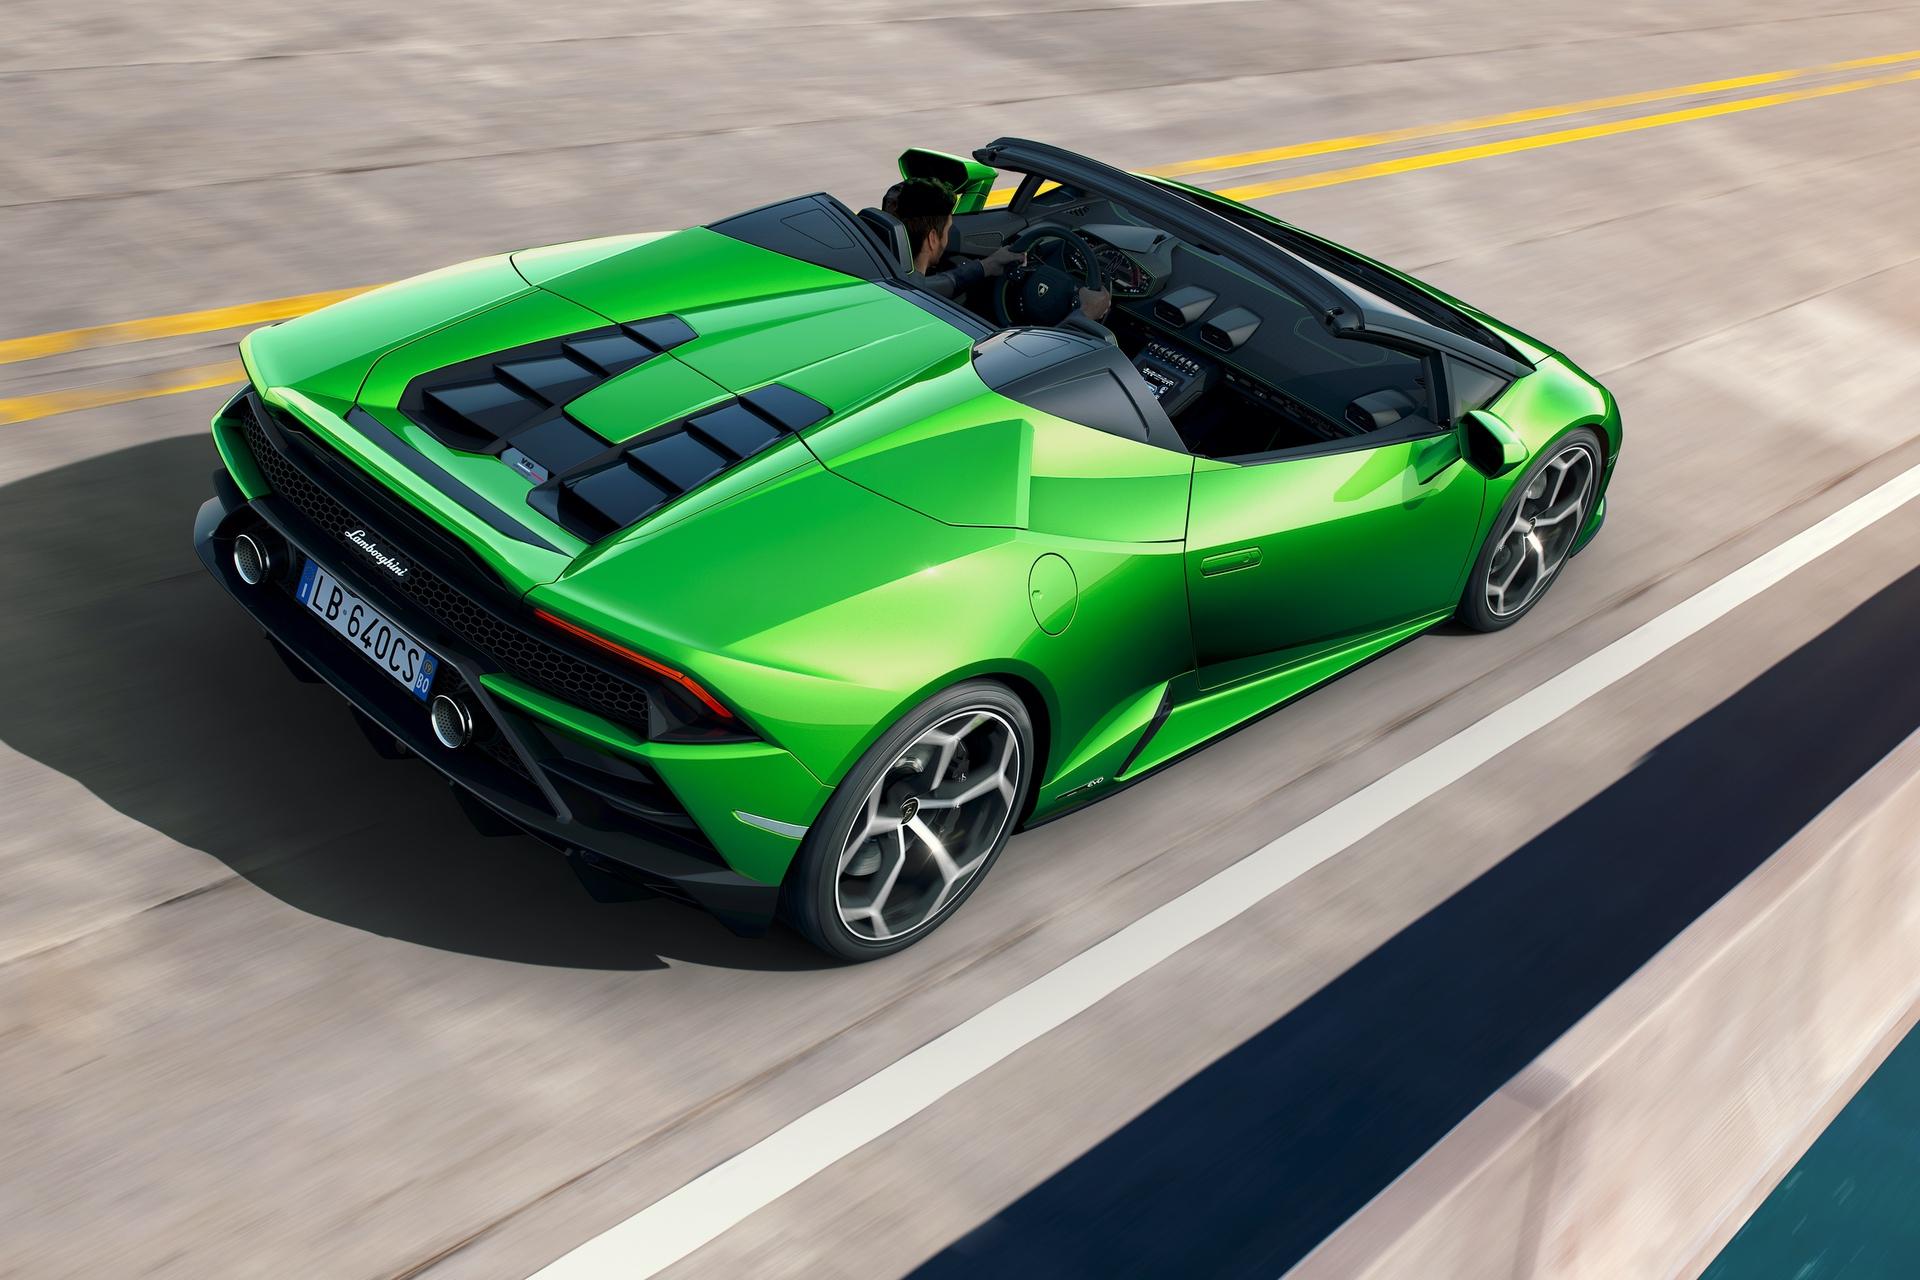 Lamborghini_Huracan_Evo_Spyder_0003